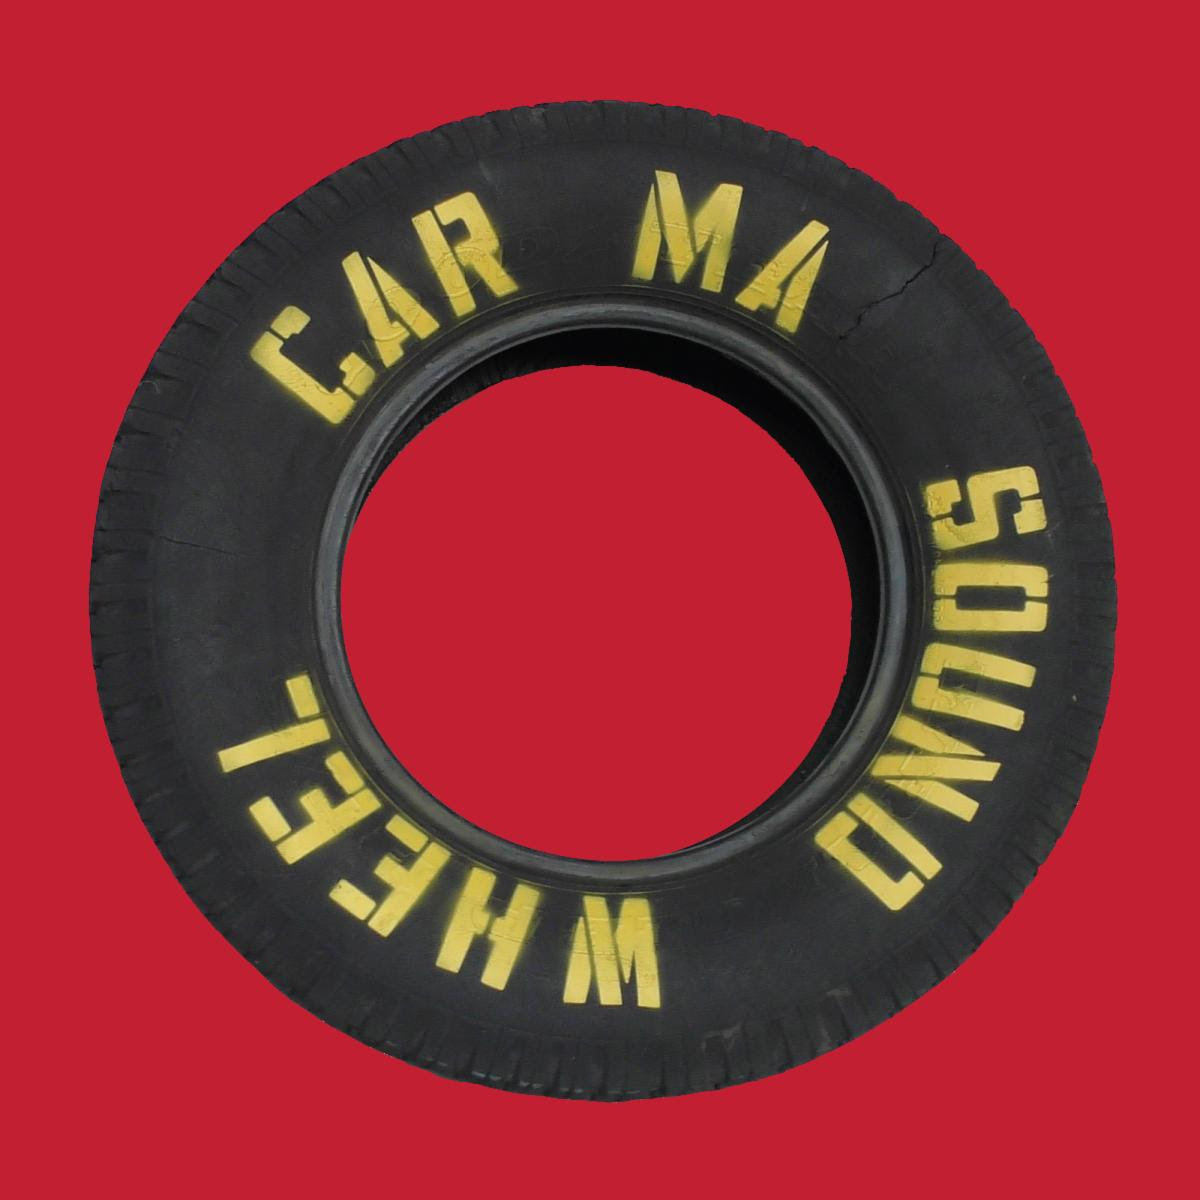 alison mosshart sound wheel album cover art Alison Mosshart Announces Spoken Word Album Sound Wheel, Shares Returning the Screw: Stream